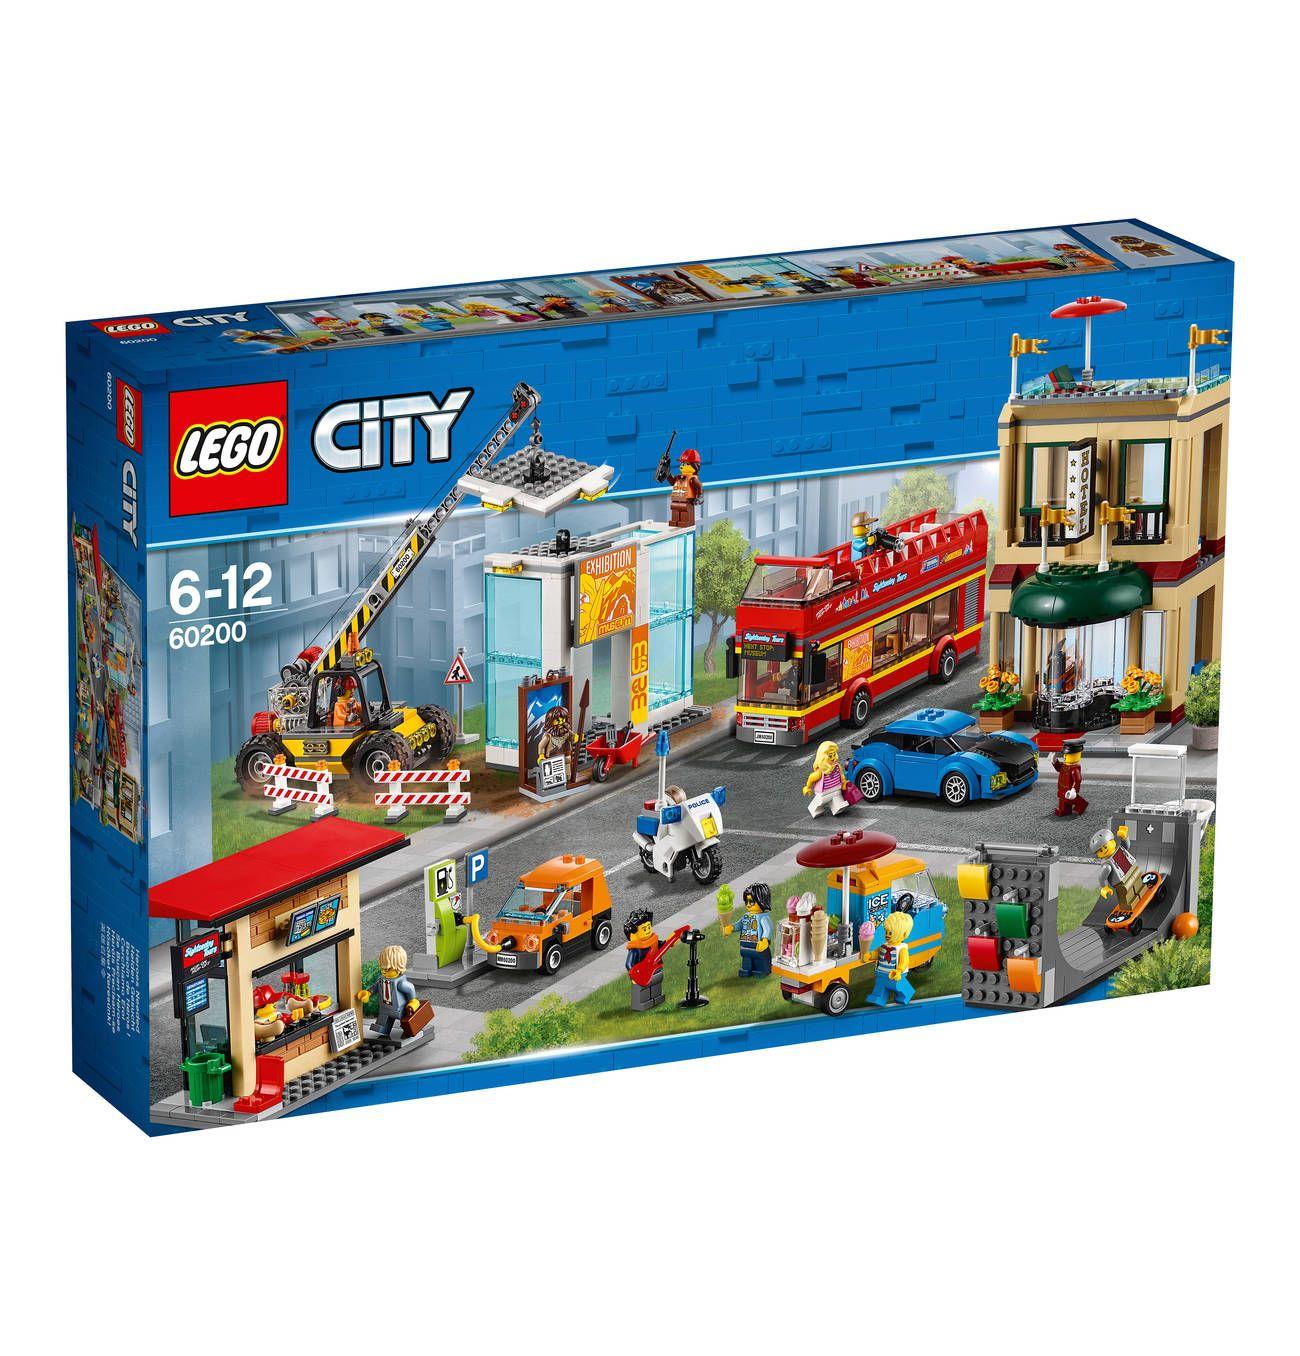 Hauptstadt 60200 Lego Pinterest Lego